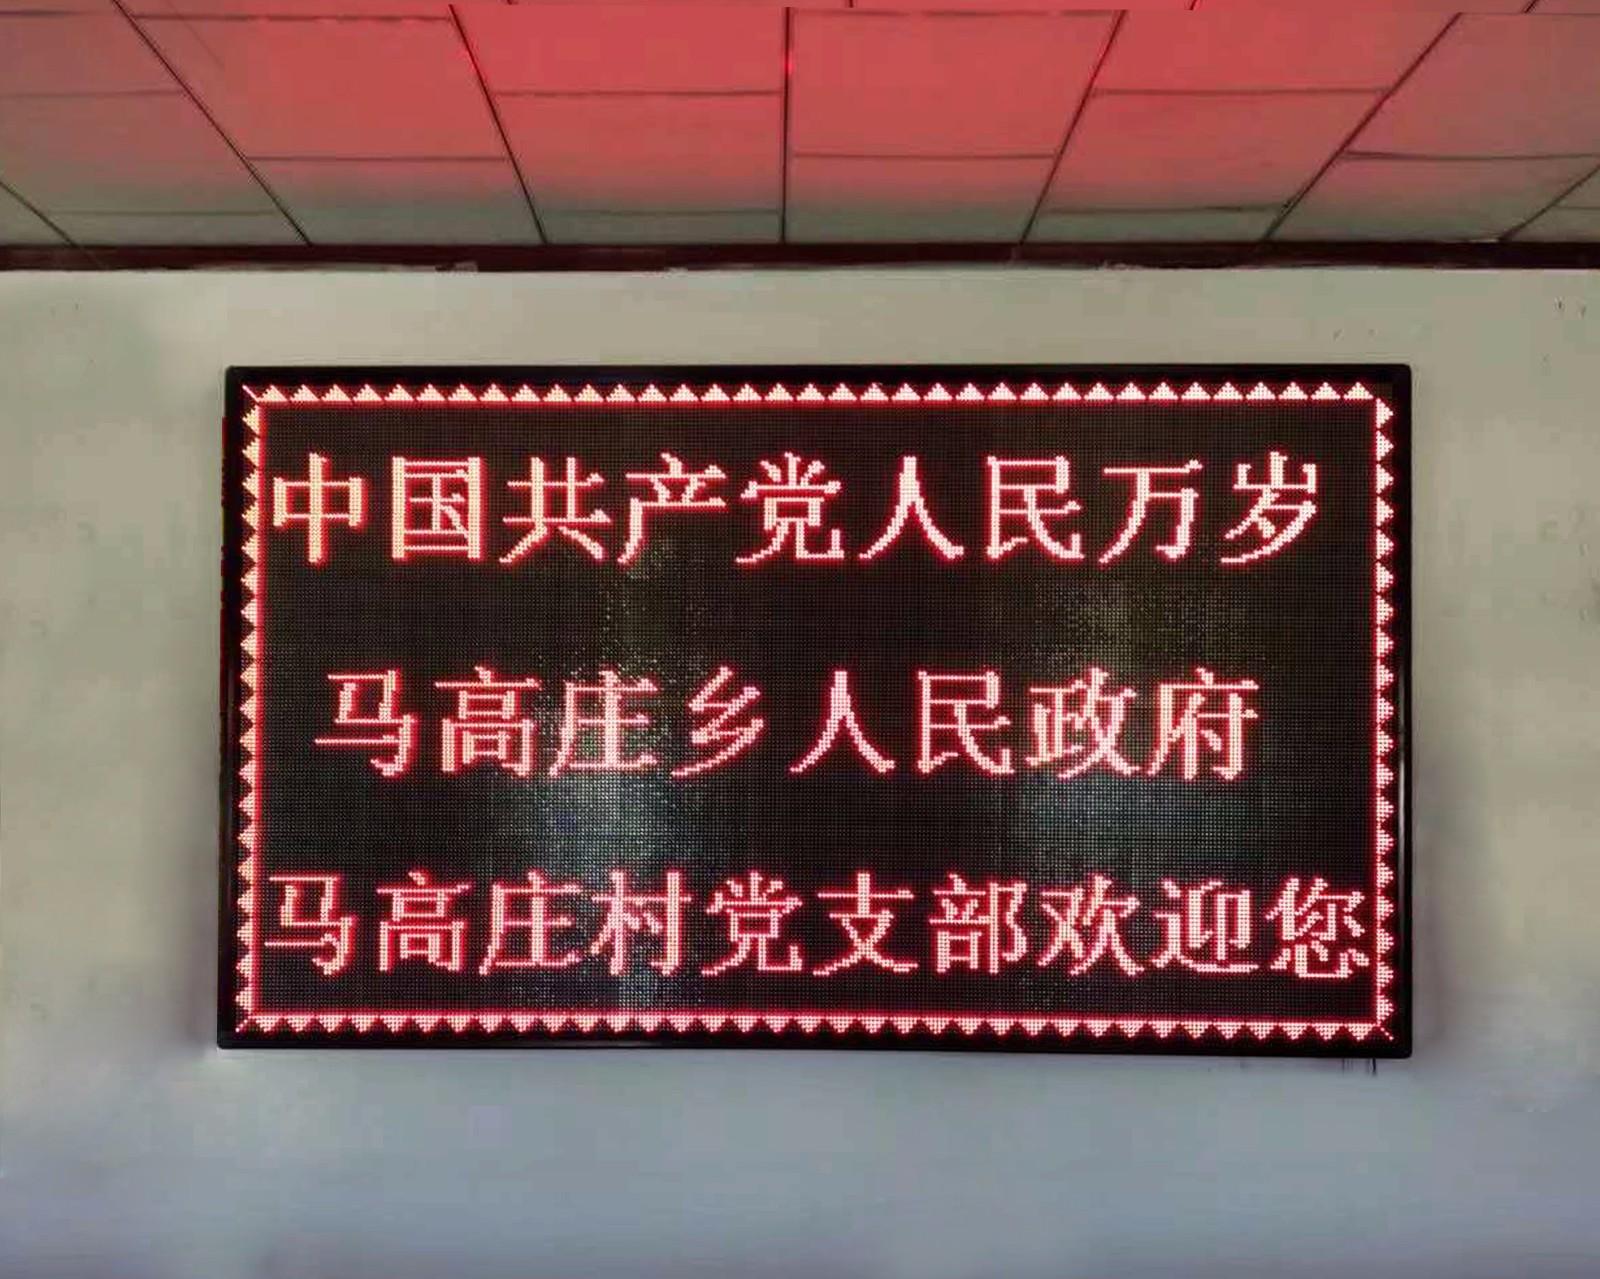 LED顯示屏室內雙基色同心縣 條屏案例展示-鑫盛達(寧夏)光電技術發展有限公司